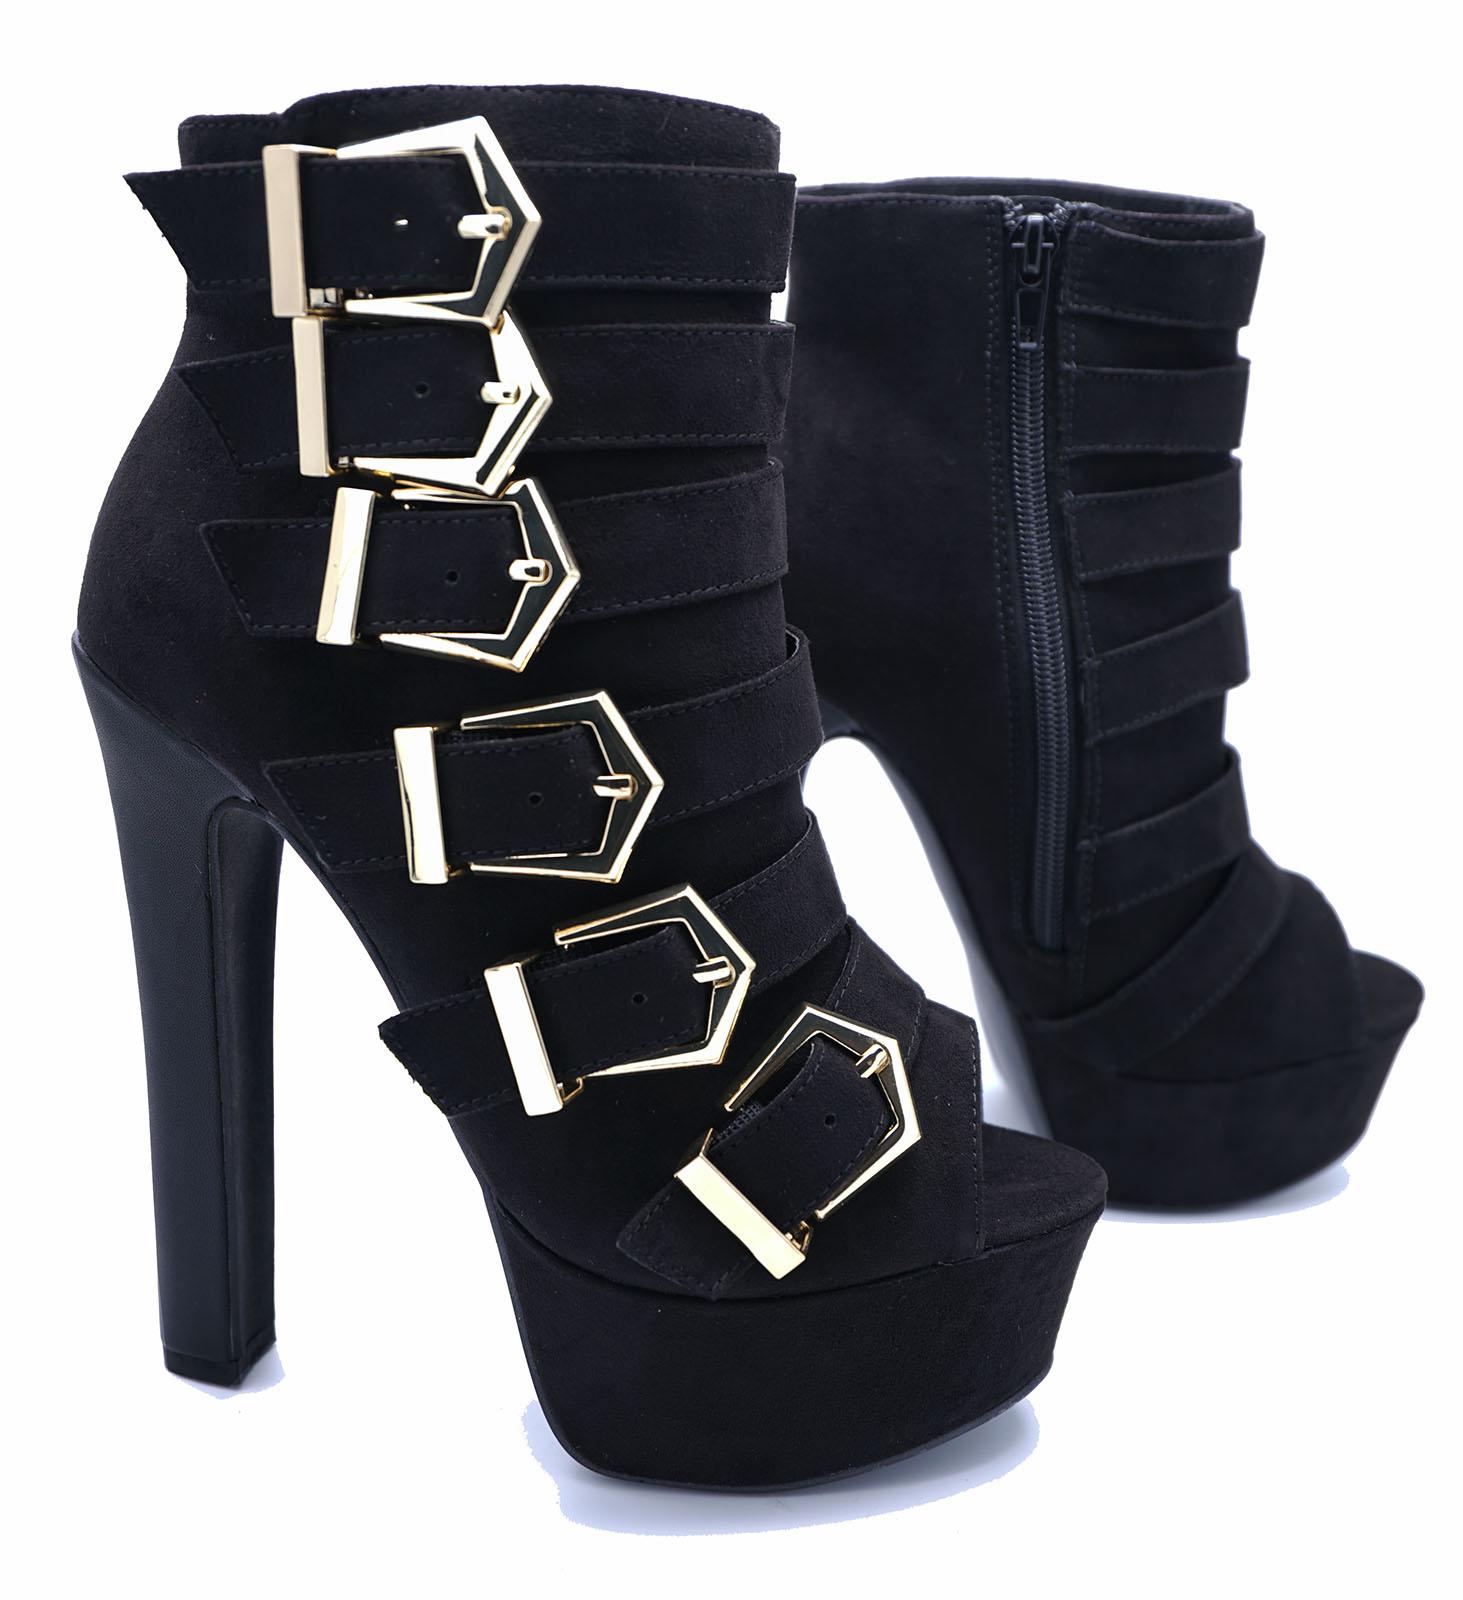 LADIES-BLACK-ZIP-UP-PLATFORM-PEEP-TOE-BUCKLE-ANKLE-CALF-HIGH-HEEL-BOOTS-SIZES-3 thumbnail 7